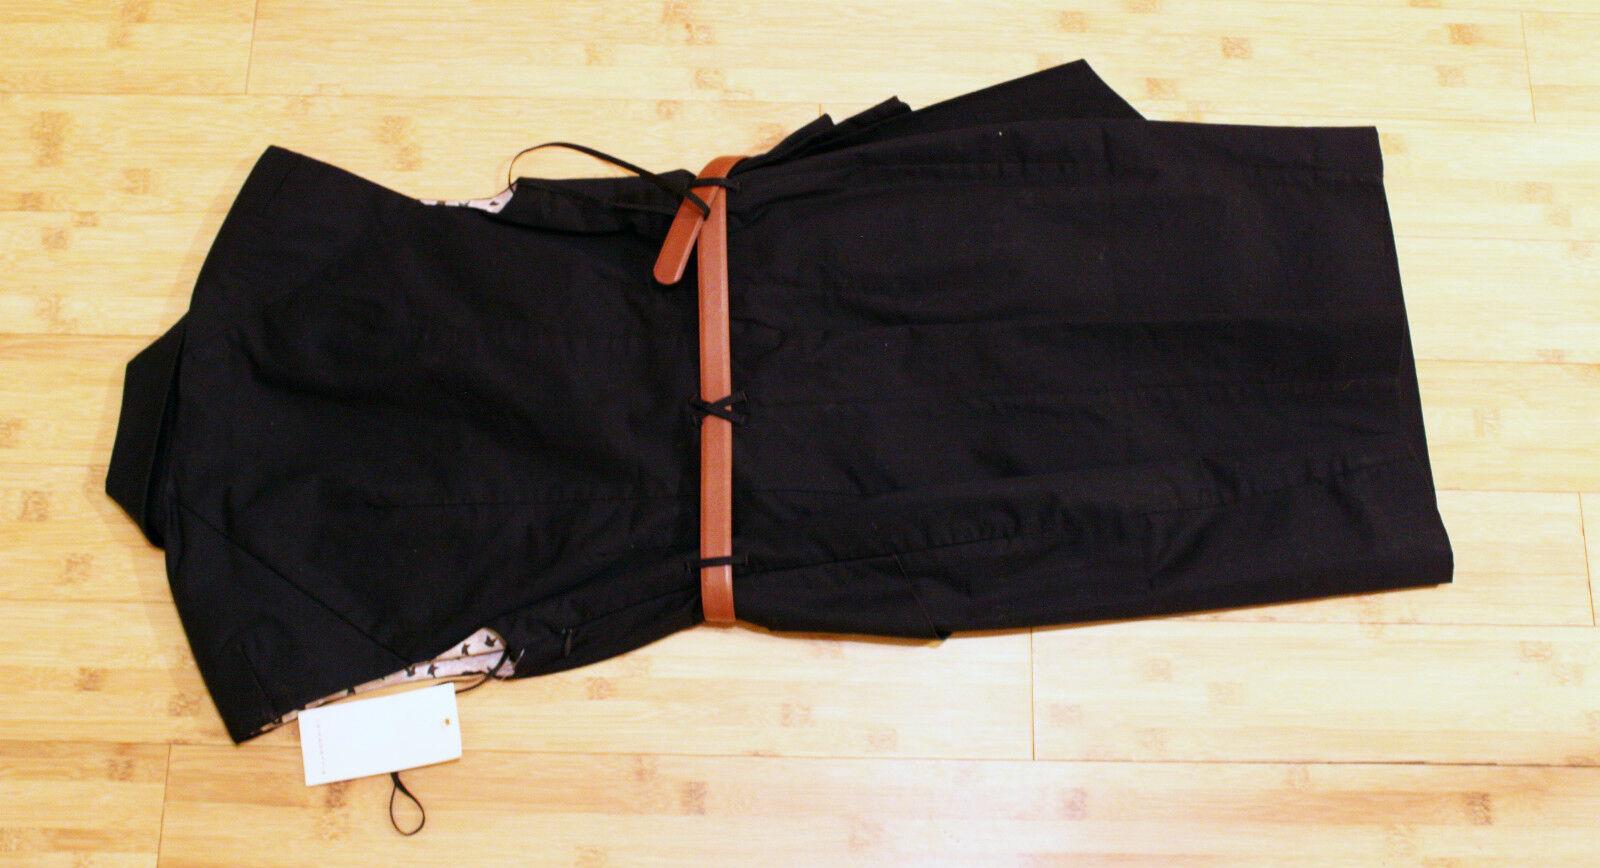 CLEARANCE     ANTHROPOLOGIE LEIFSDOTTIR DEEP NAVY DRESS 0 NWT  345 9ff499